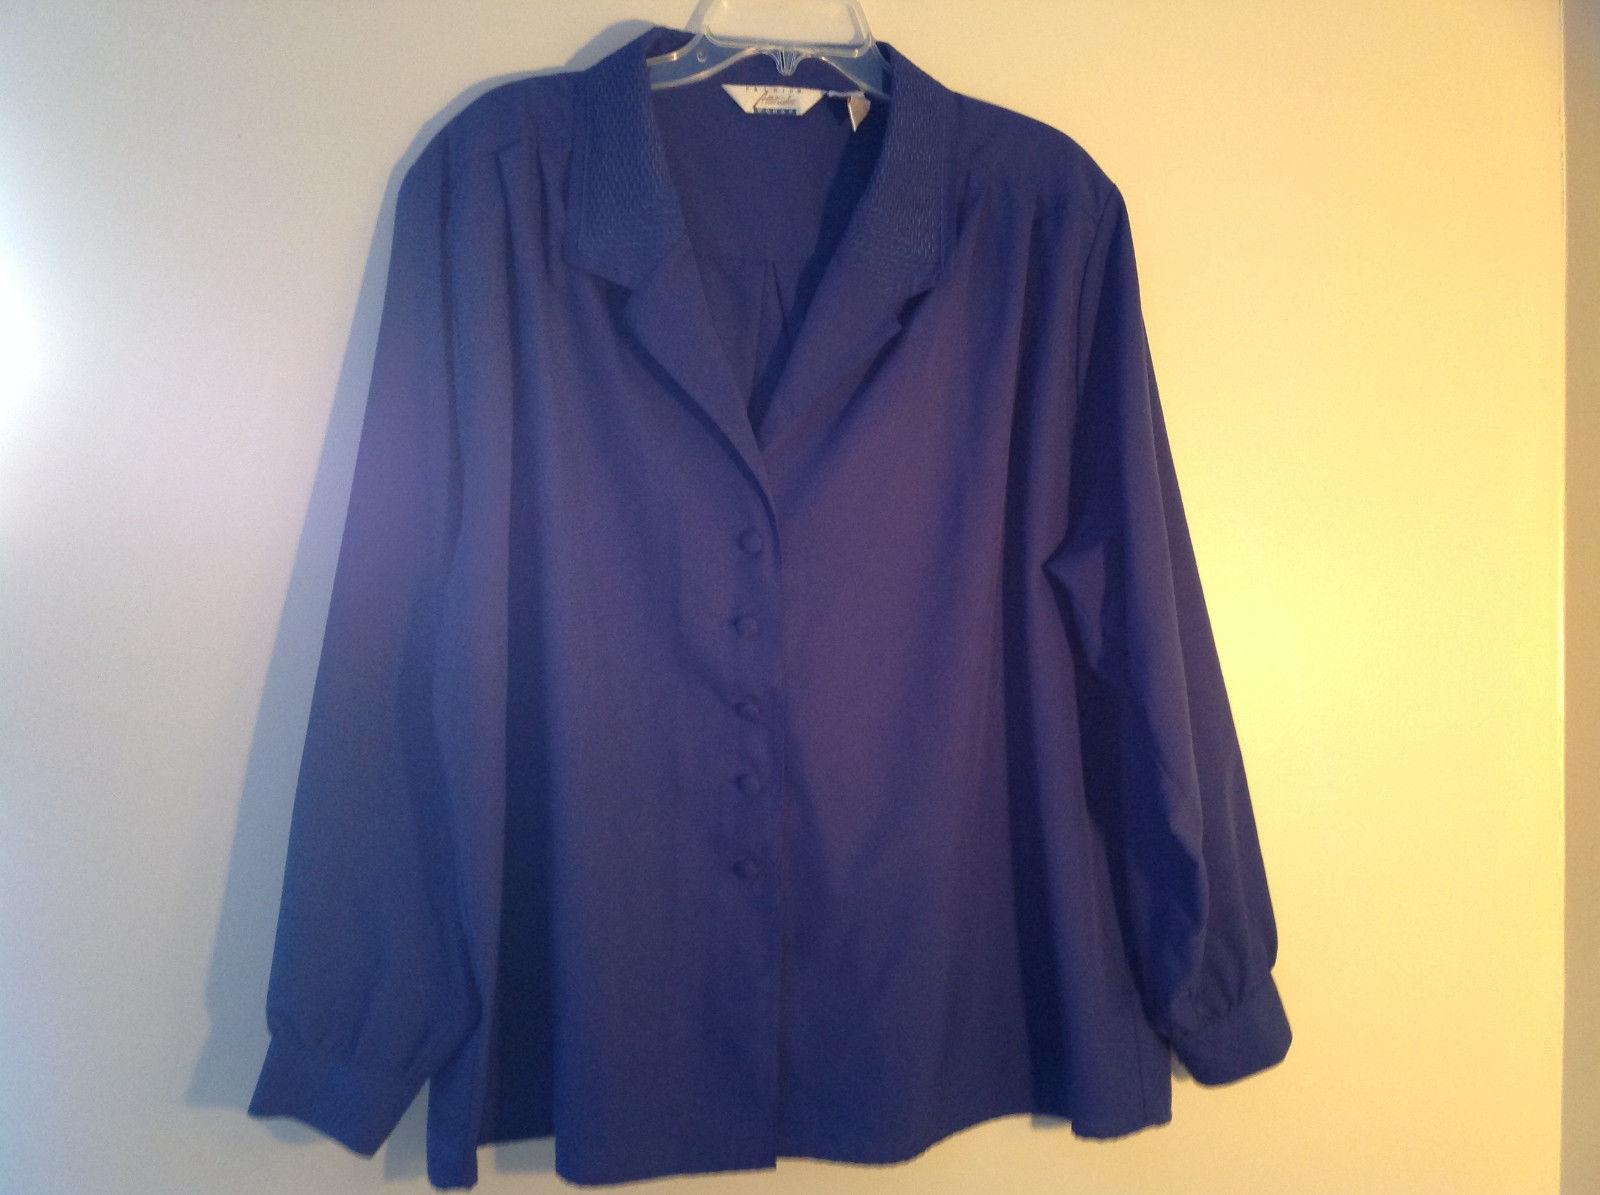 Fashion Attitudes Royal Blue V-Neckline Button Up Long Sleeve Blouse Size 24W